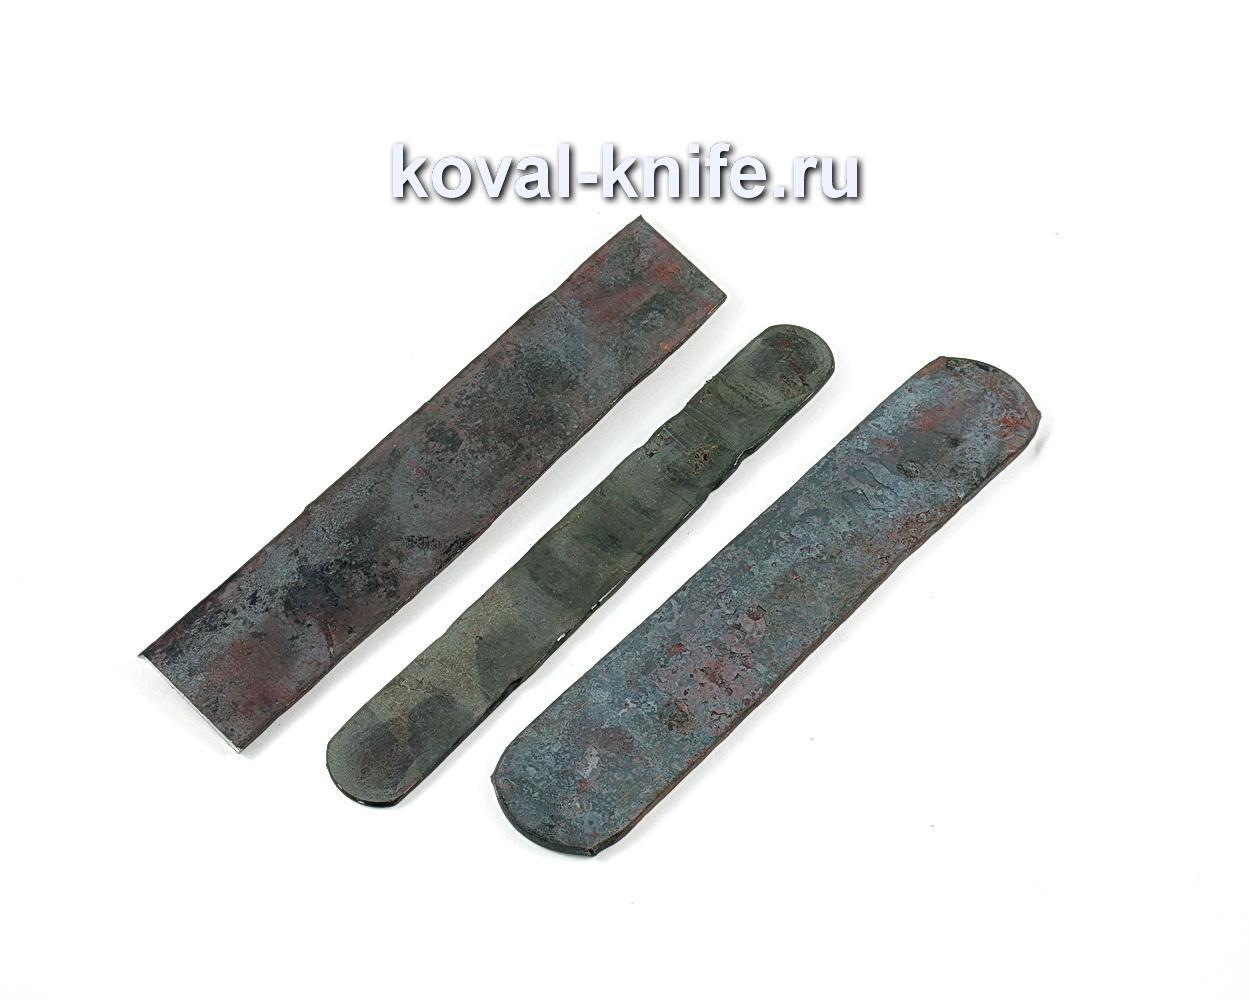 Кованая заготовка из алмазной стали ХВ5, 250-260х40х4мм.